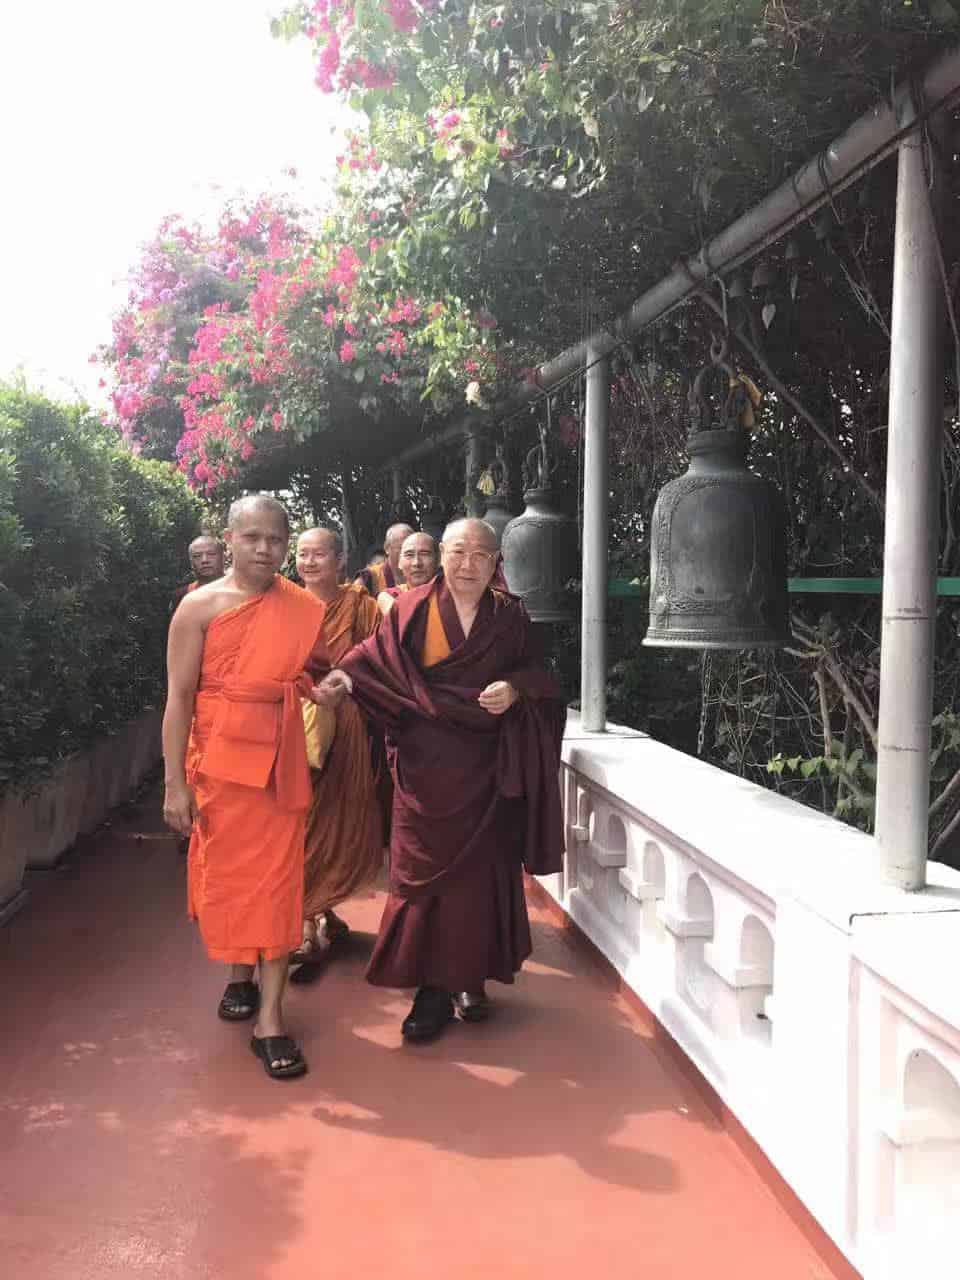 Gosok Rinpoche Thailand 2017 T026 55c5537c132a1338a9b9bcc1b2a533a